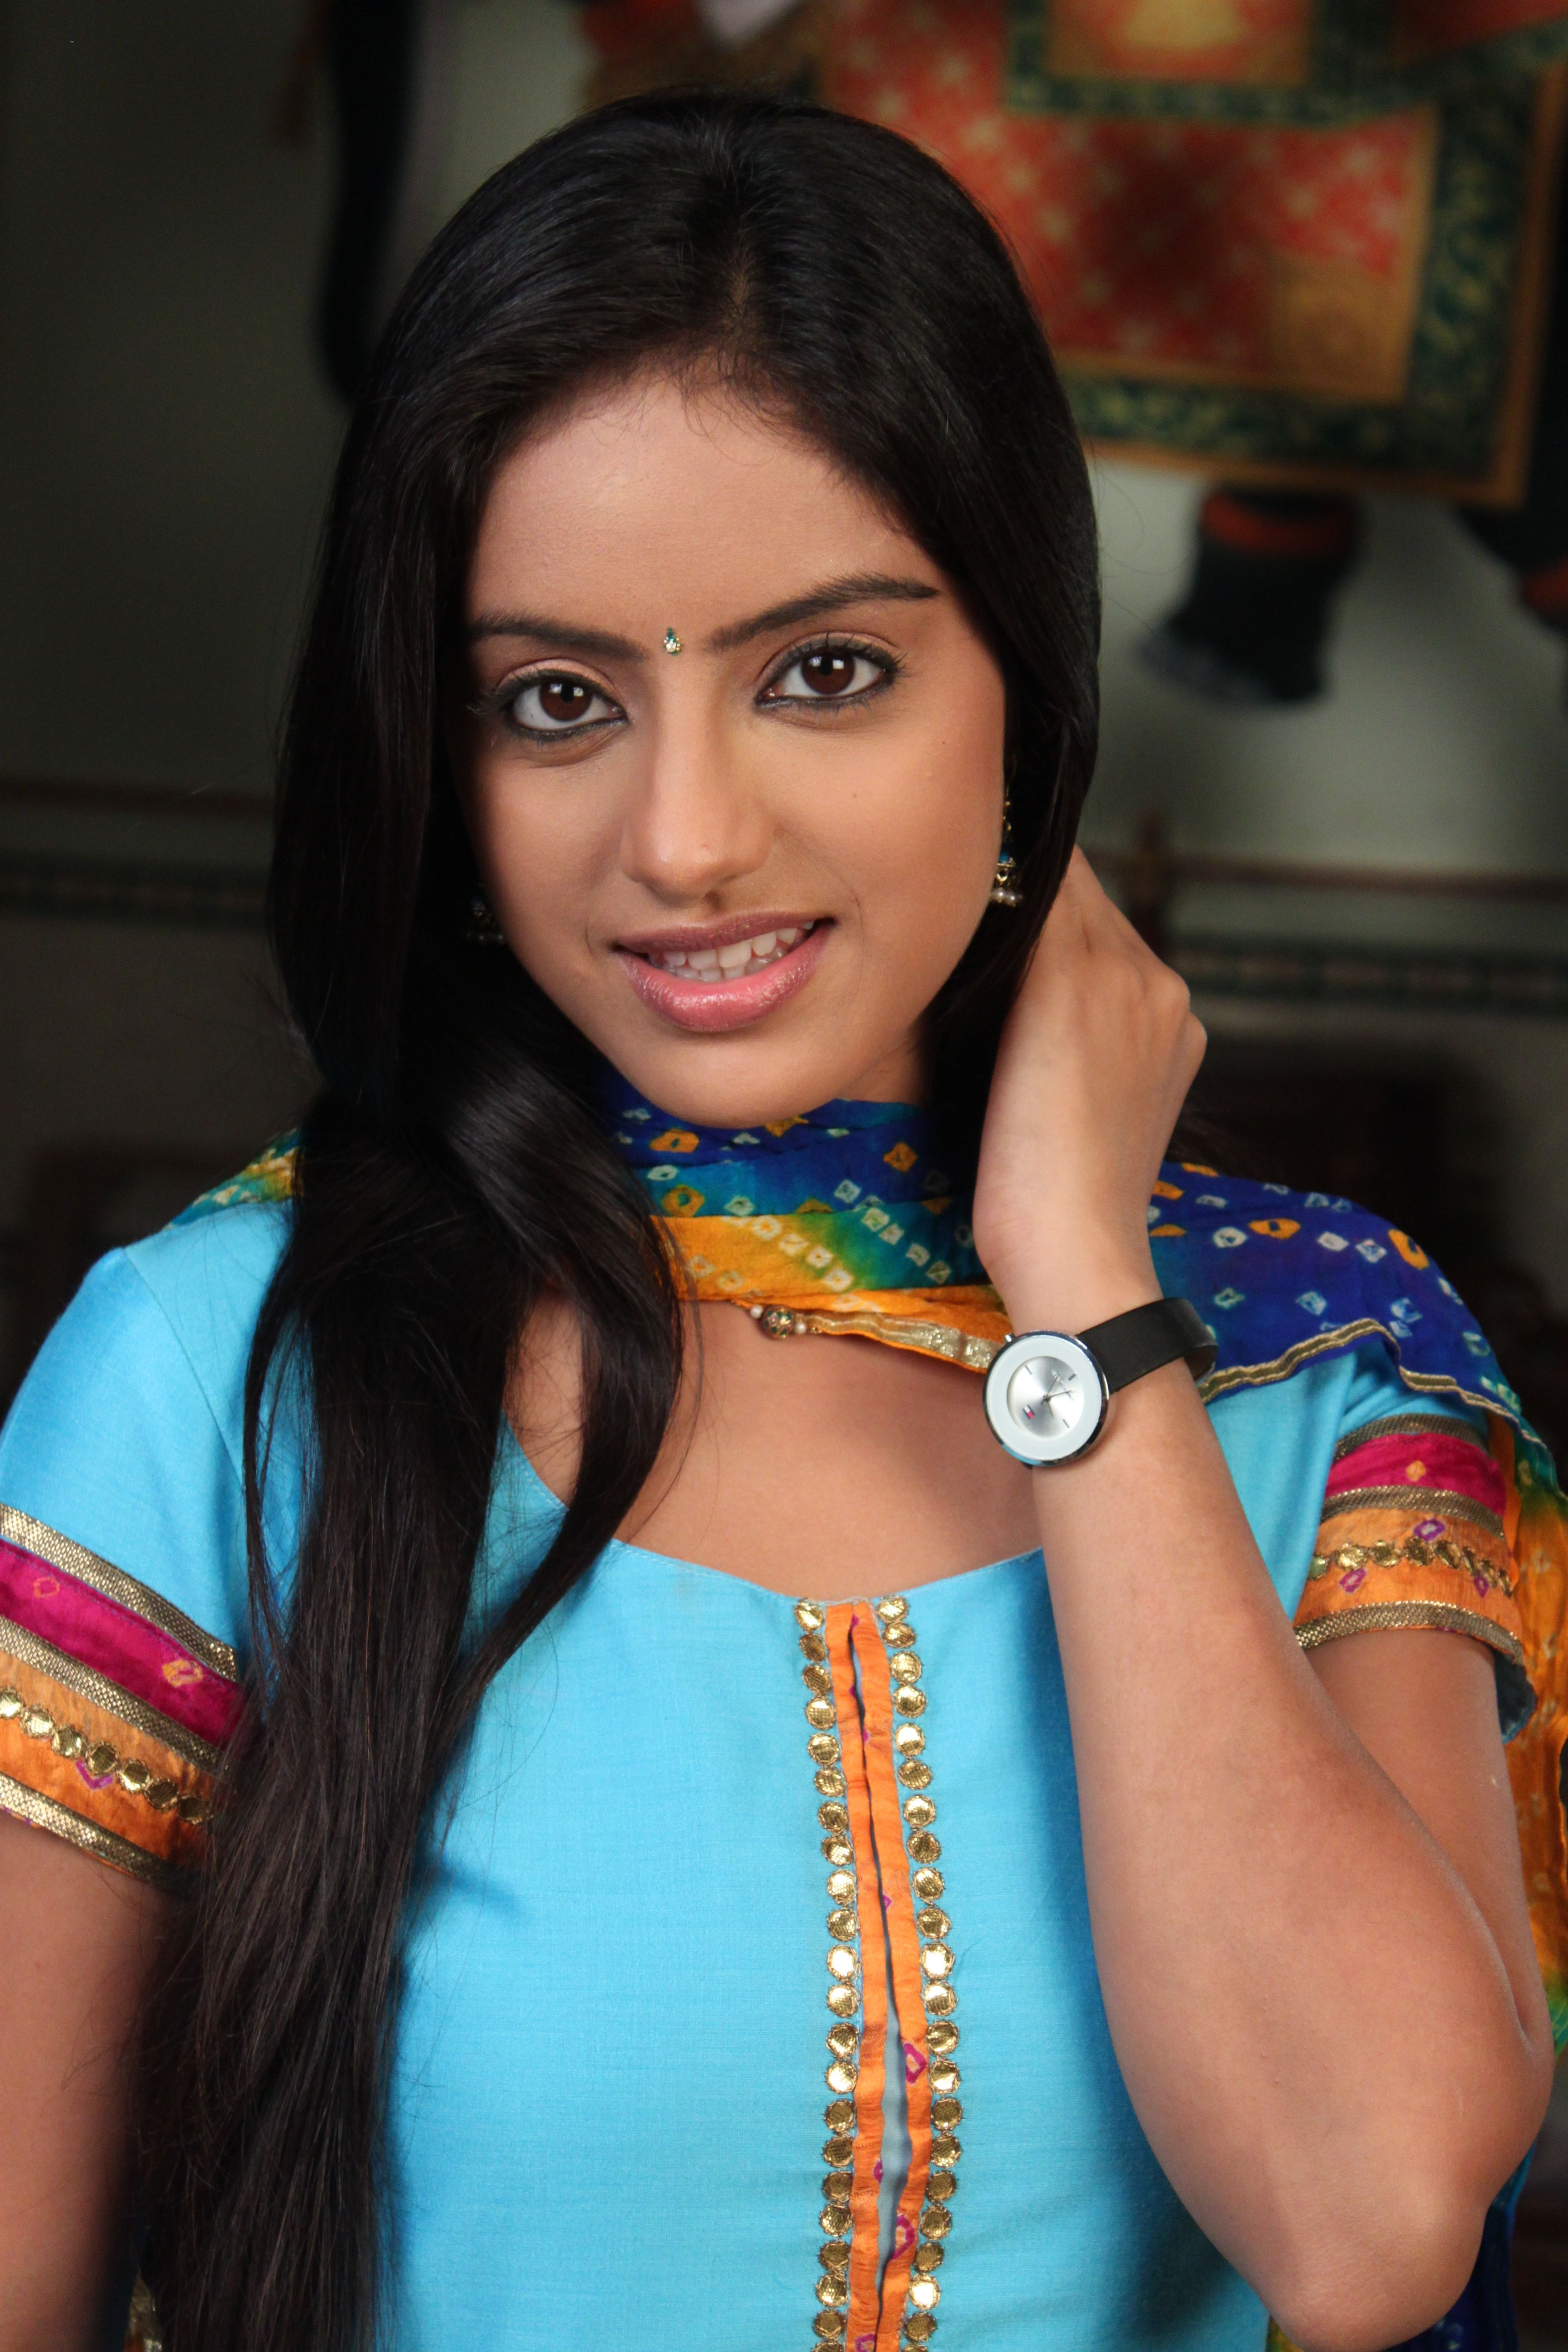 diya aur baati hum-star cast working stills   actress hot